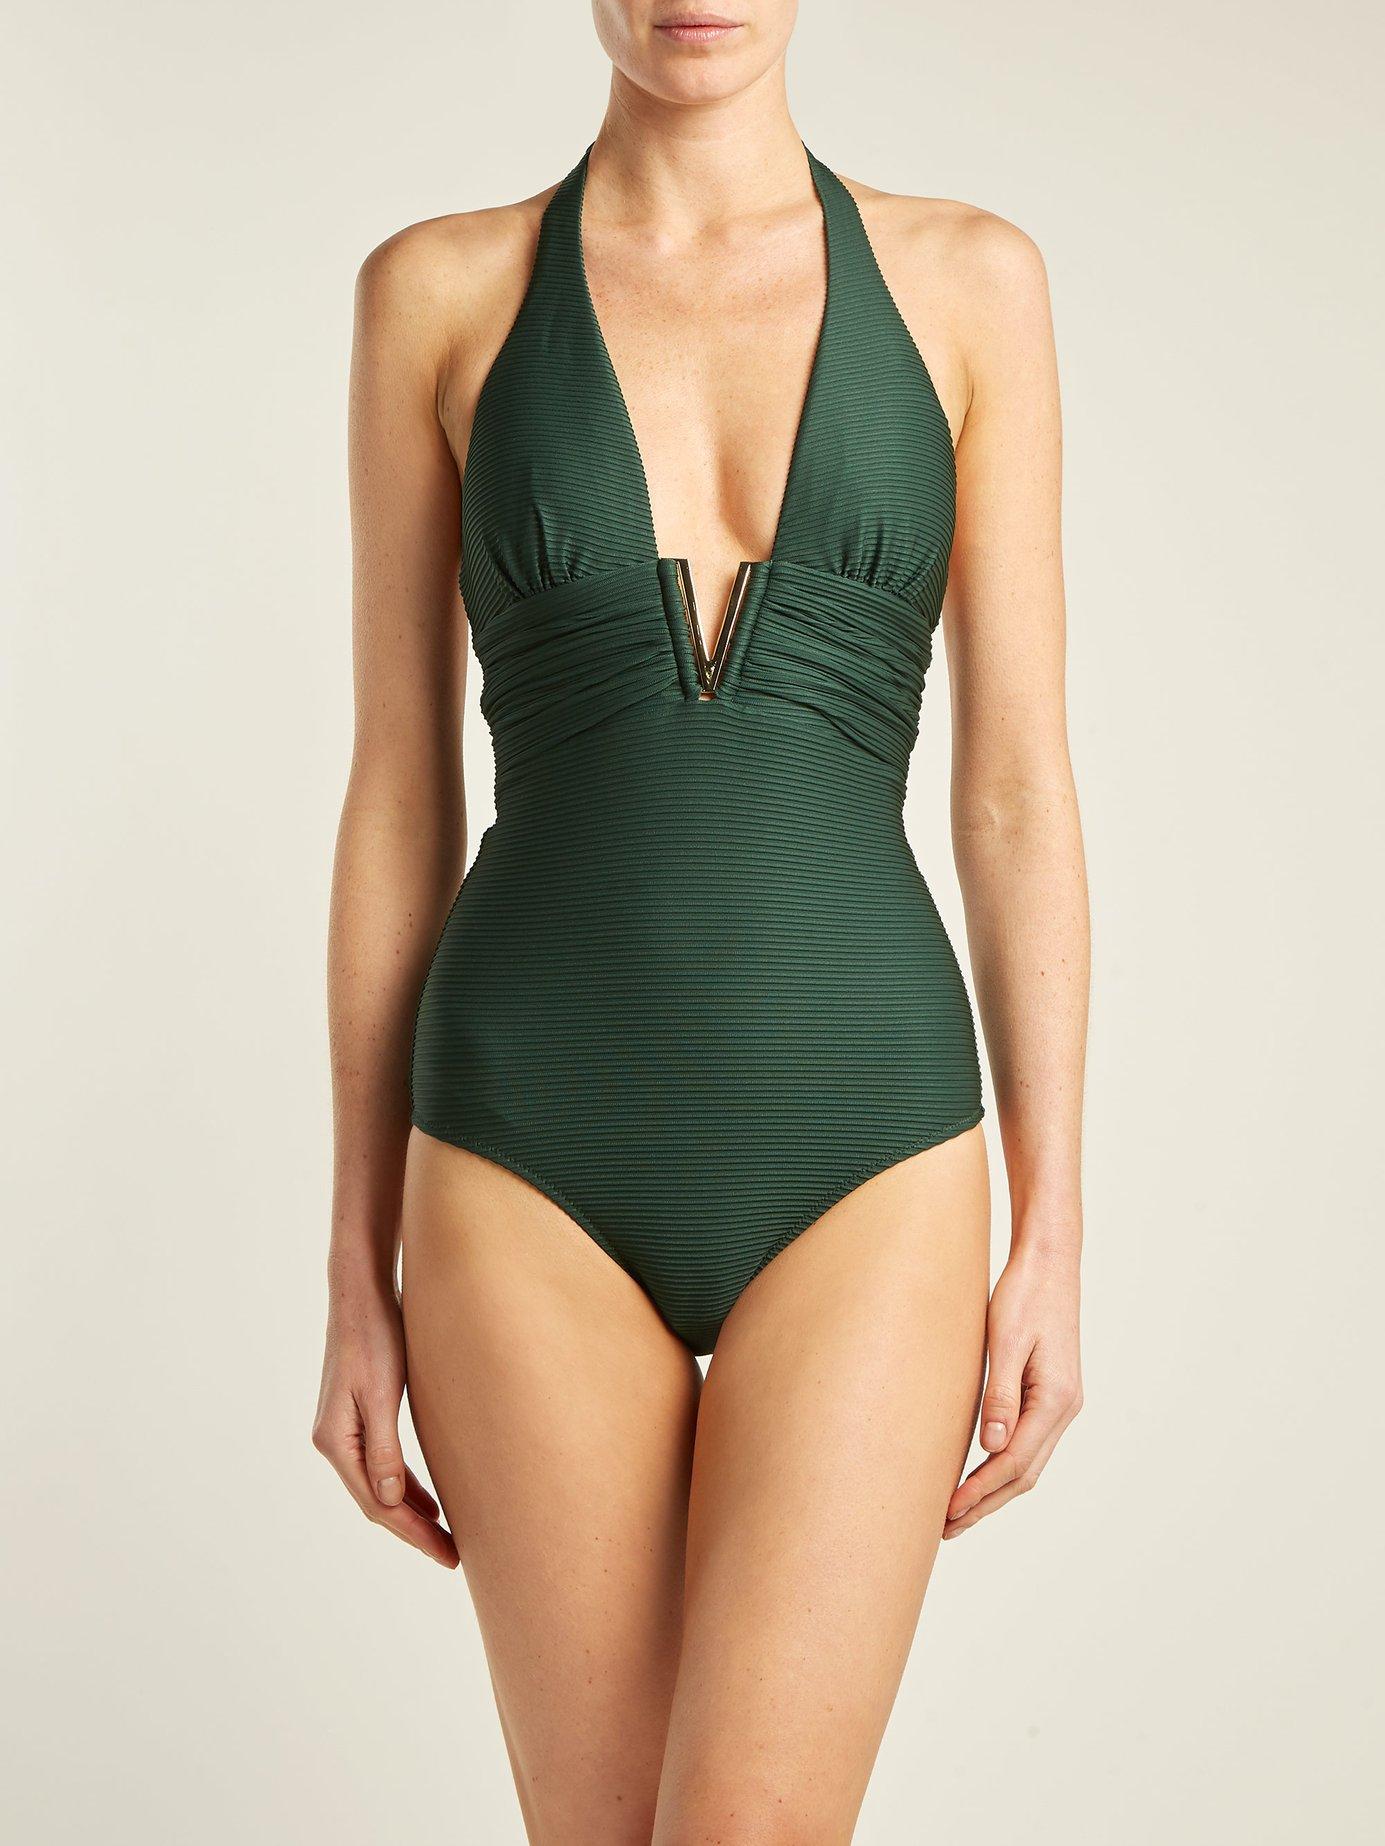 Polynesia V-bar ribbed swimsuit by Heidi Klein